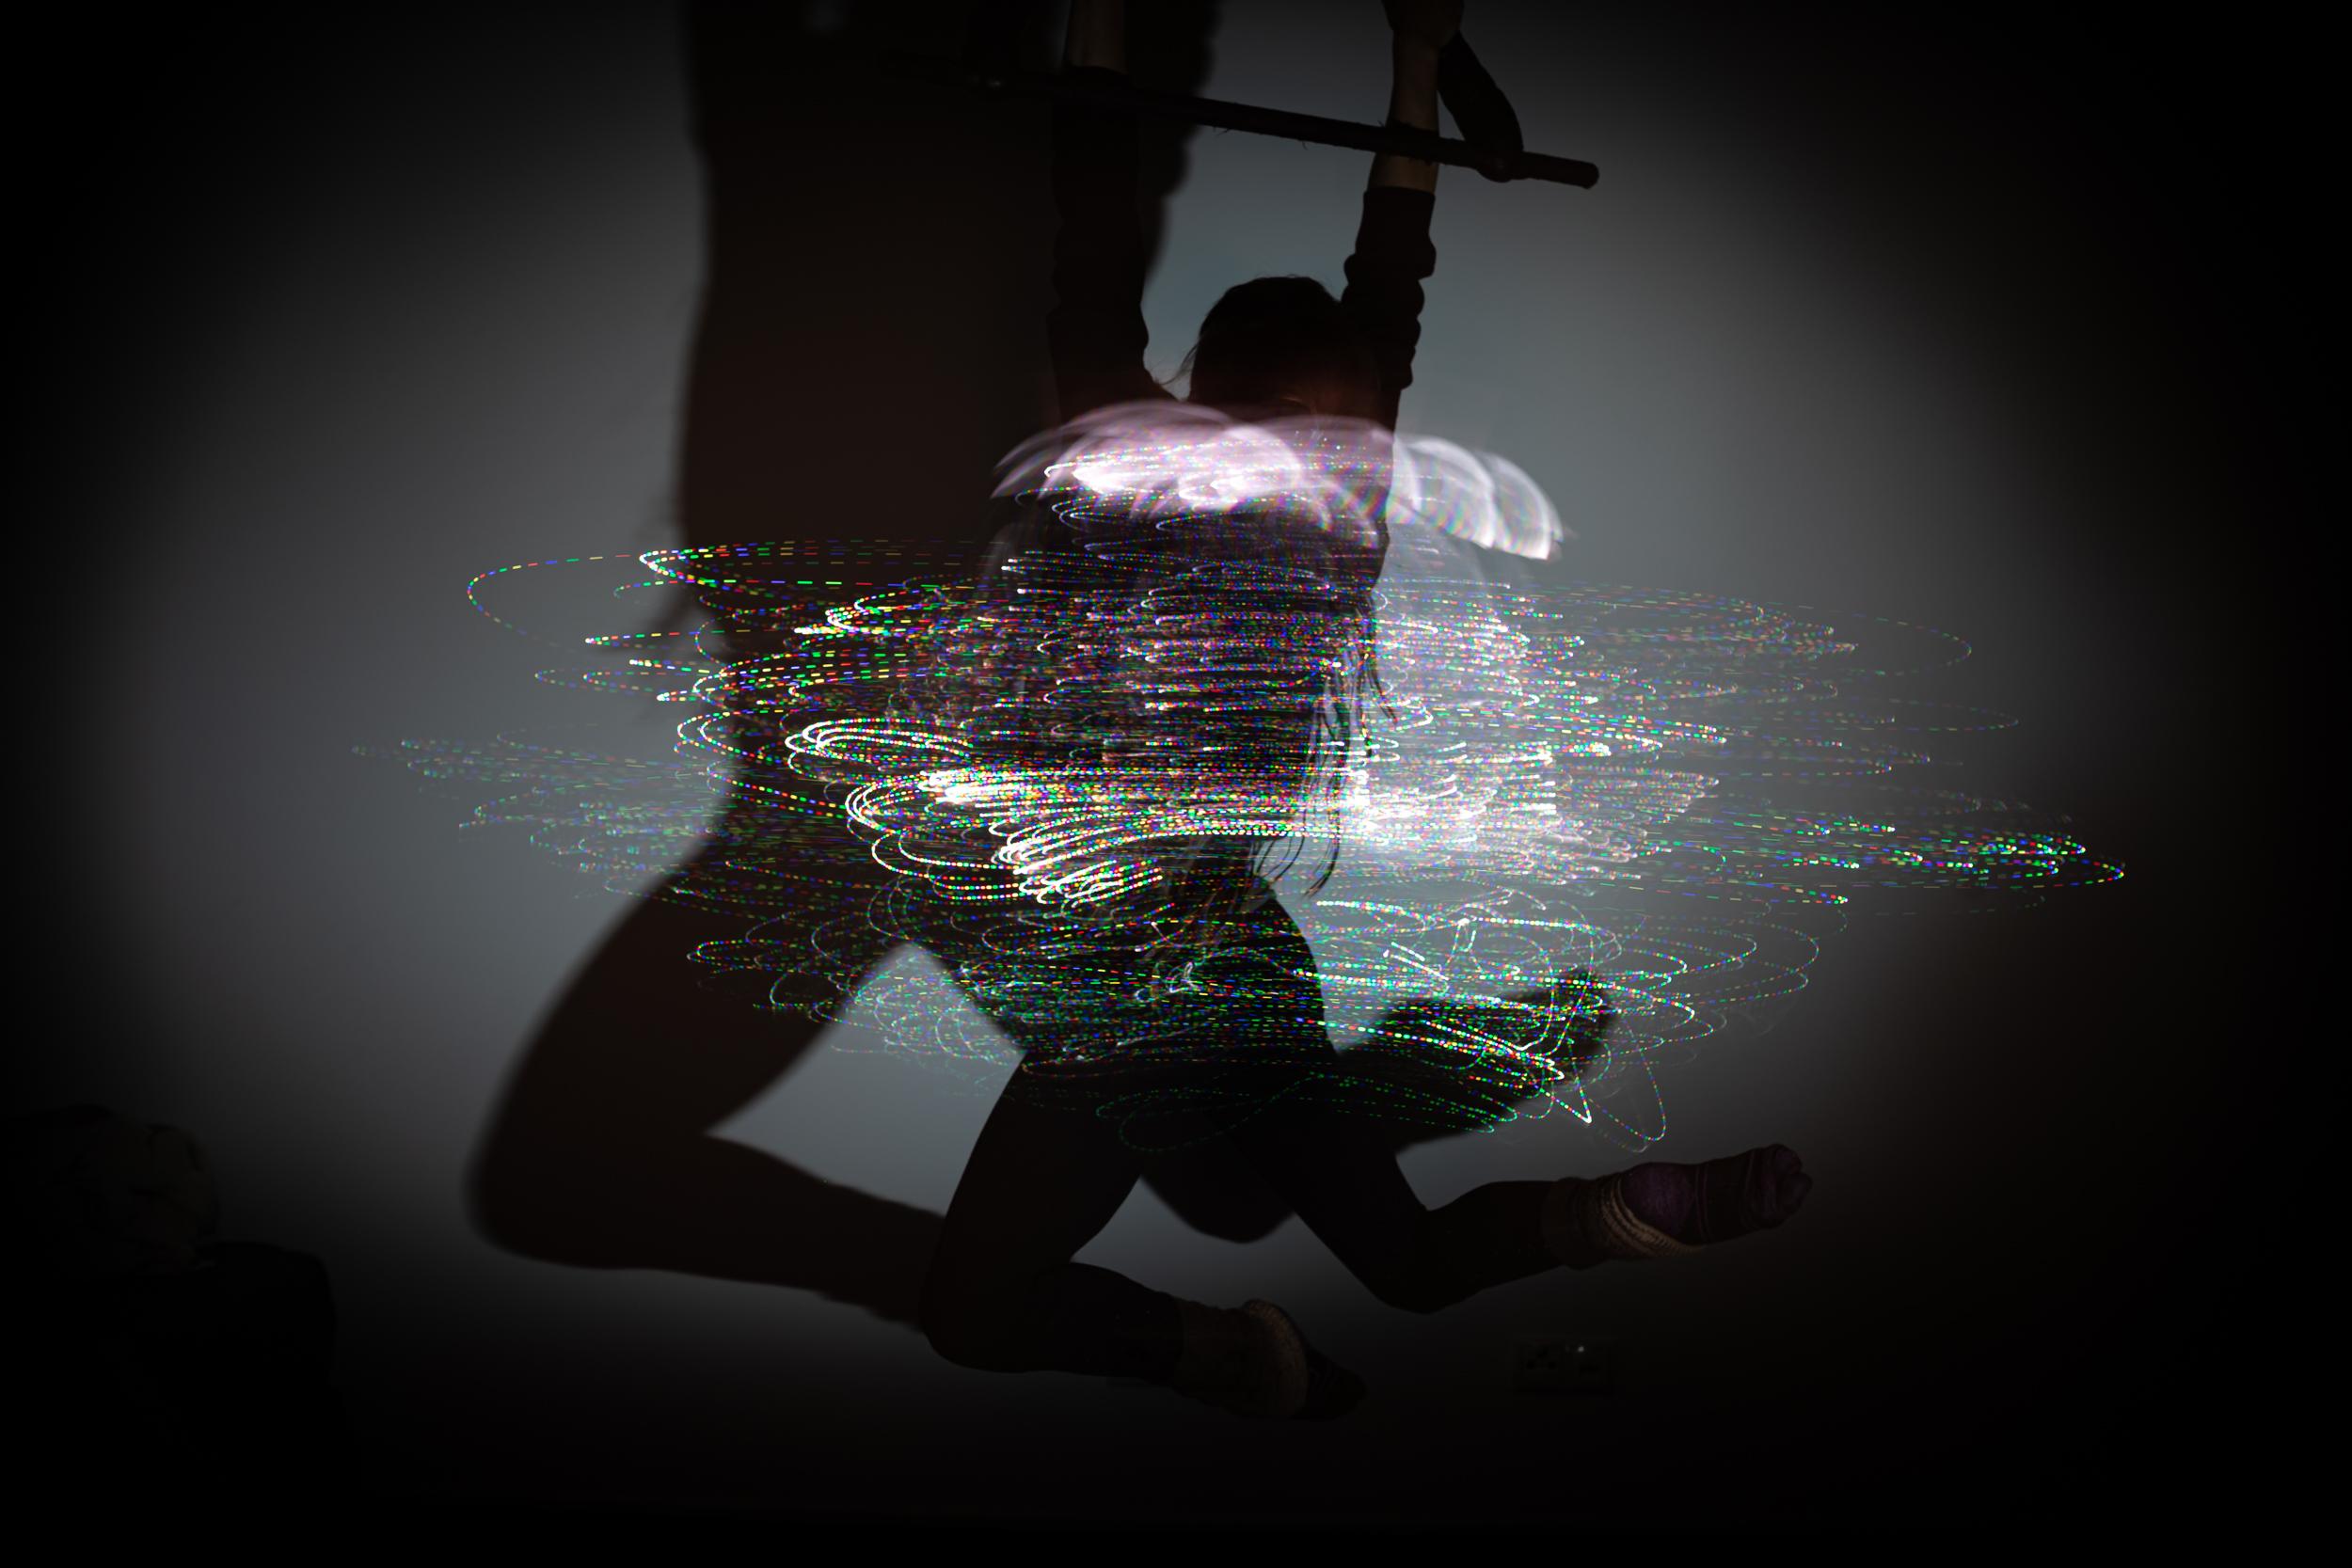 2020_04_17_Stayhome-Liv-Nati-LP (12)-LR-2.jpg